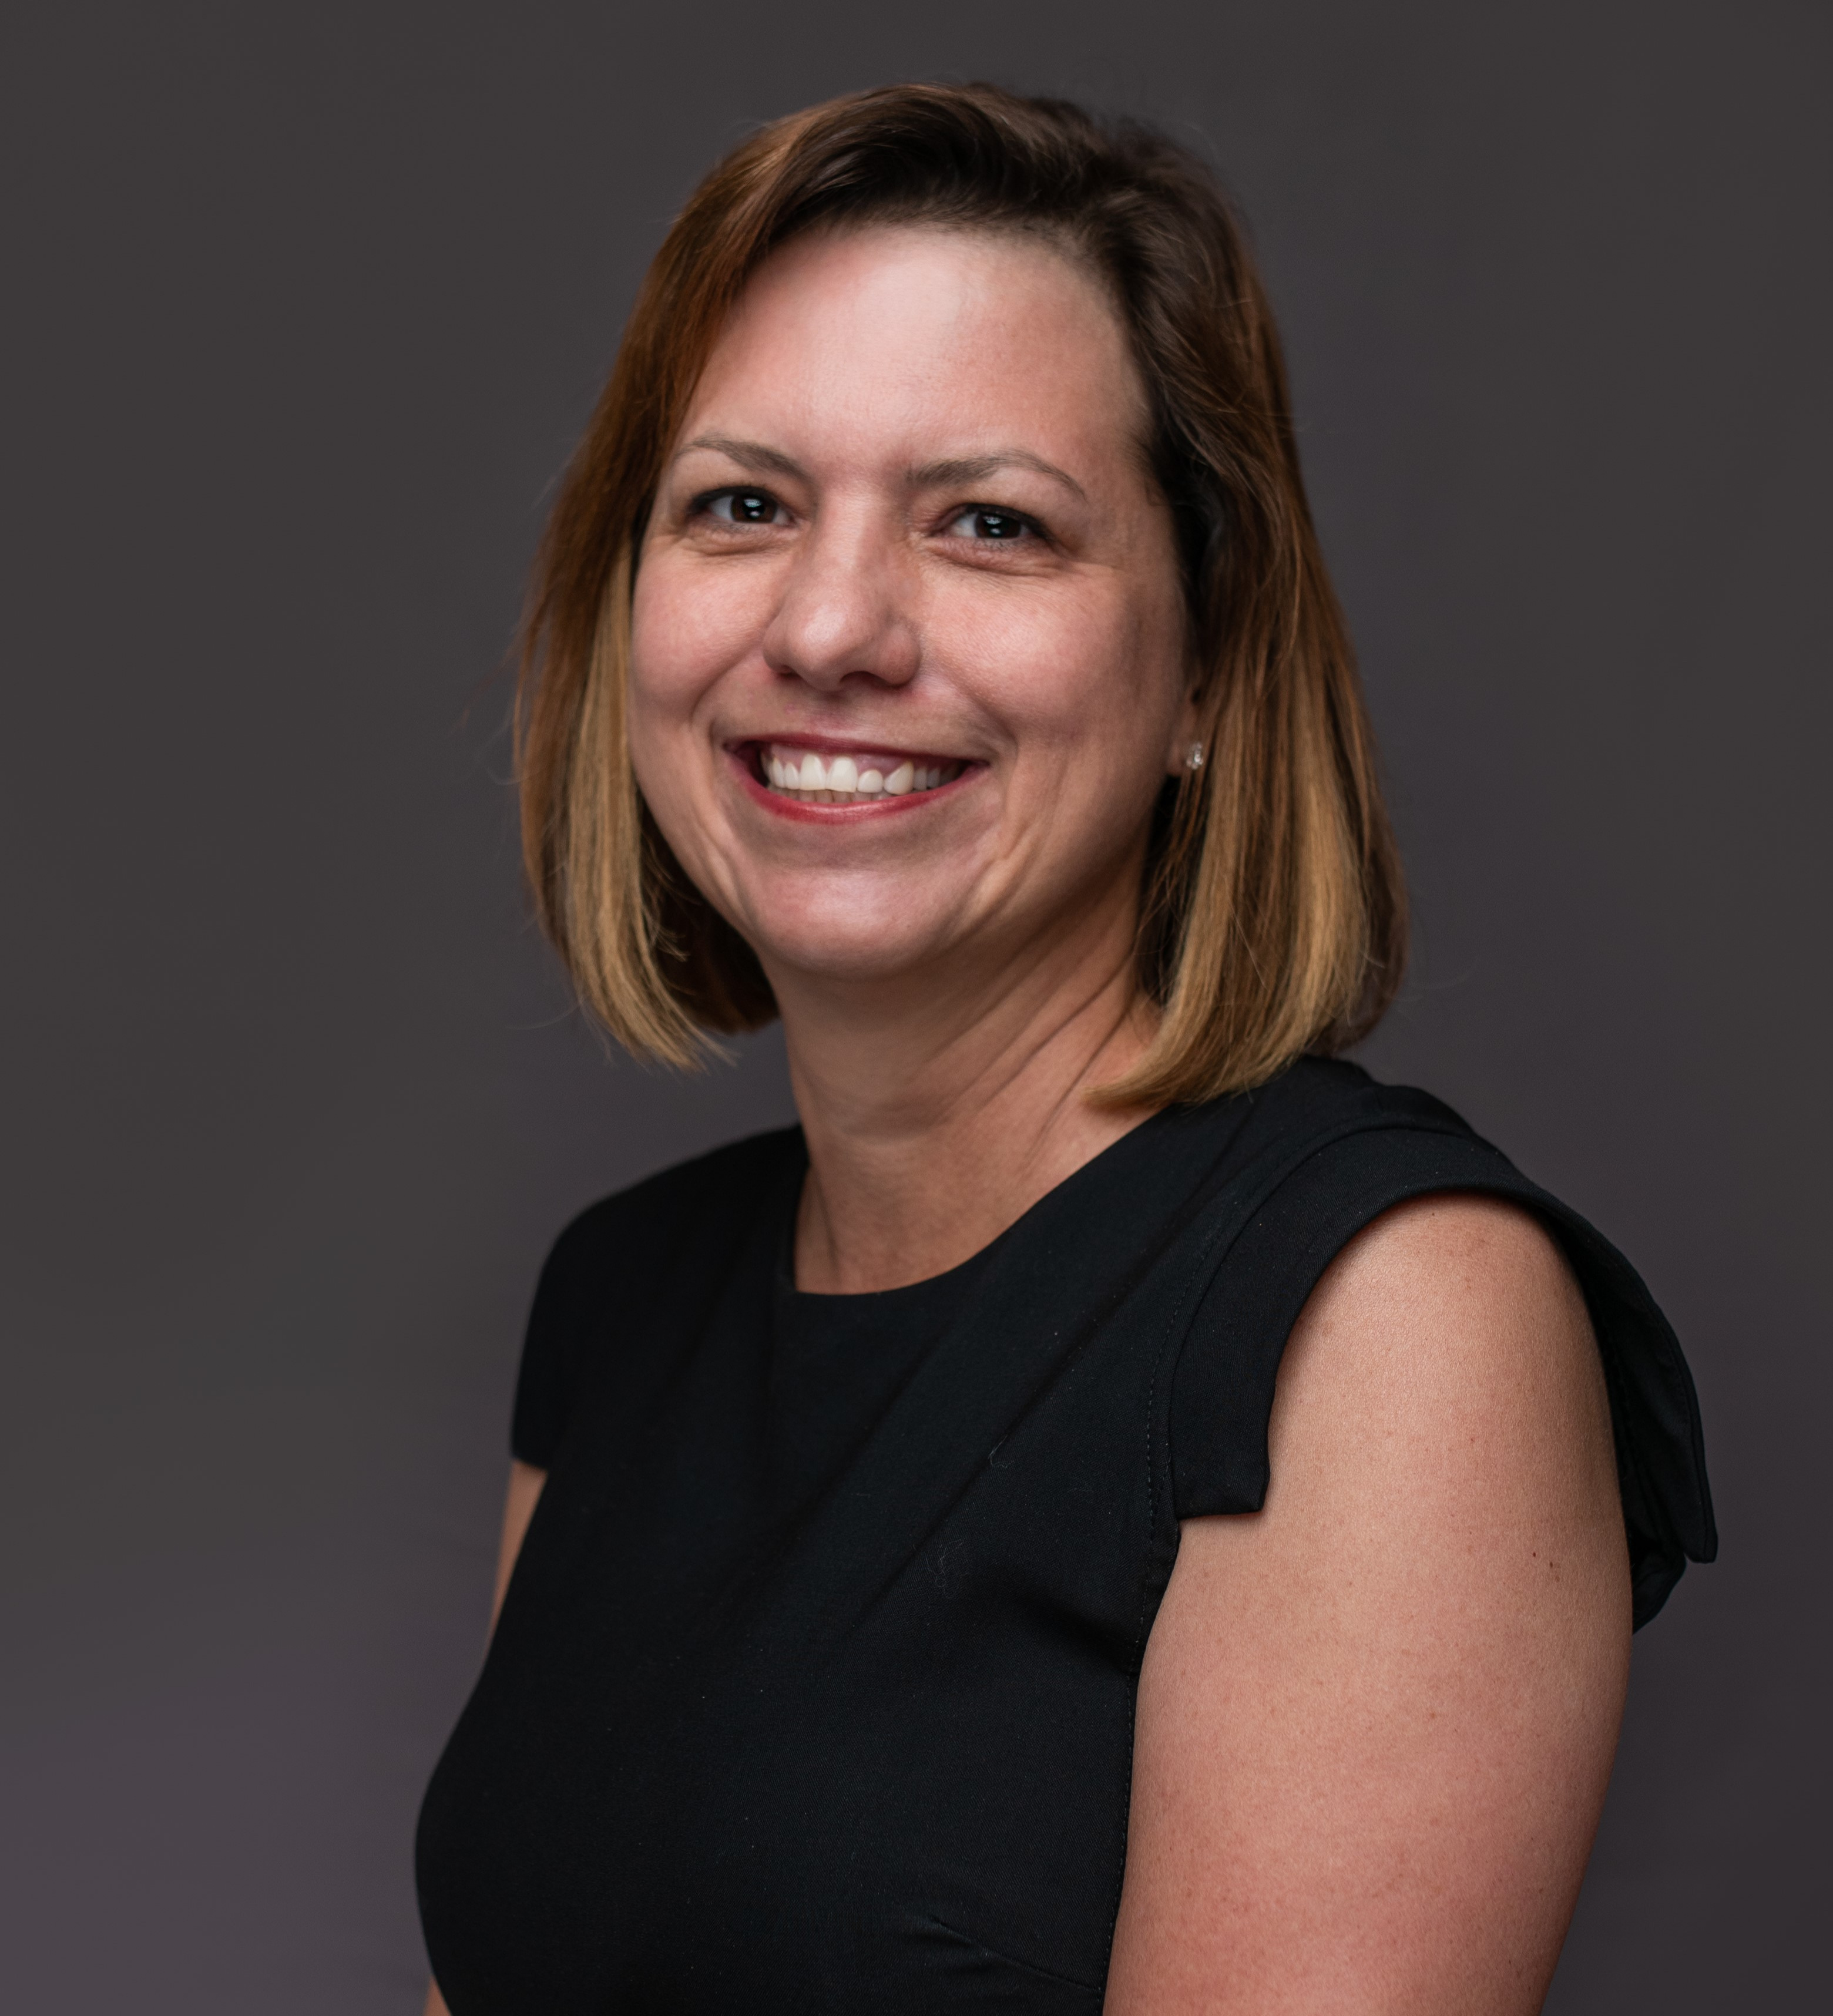 Jennifer Zumarraga's Profile Image